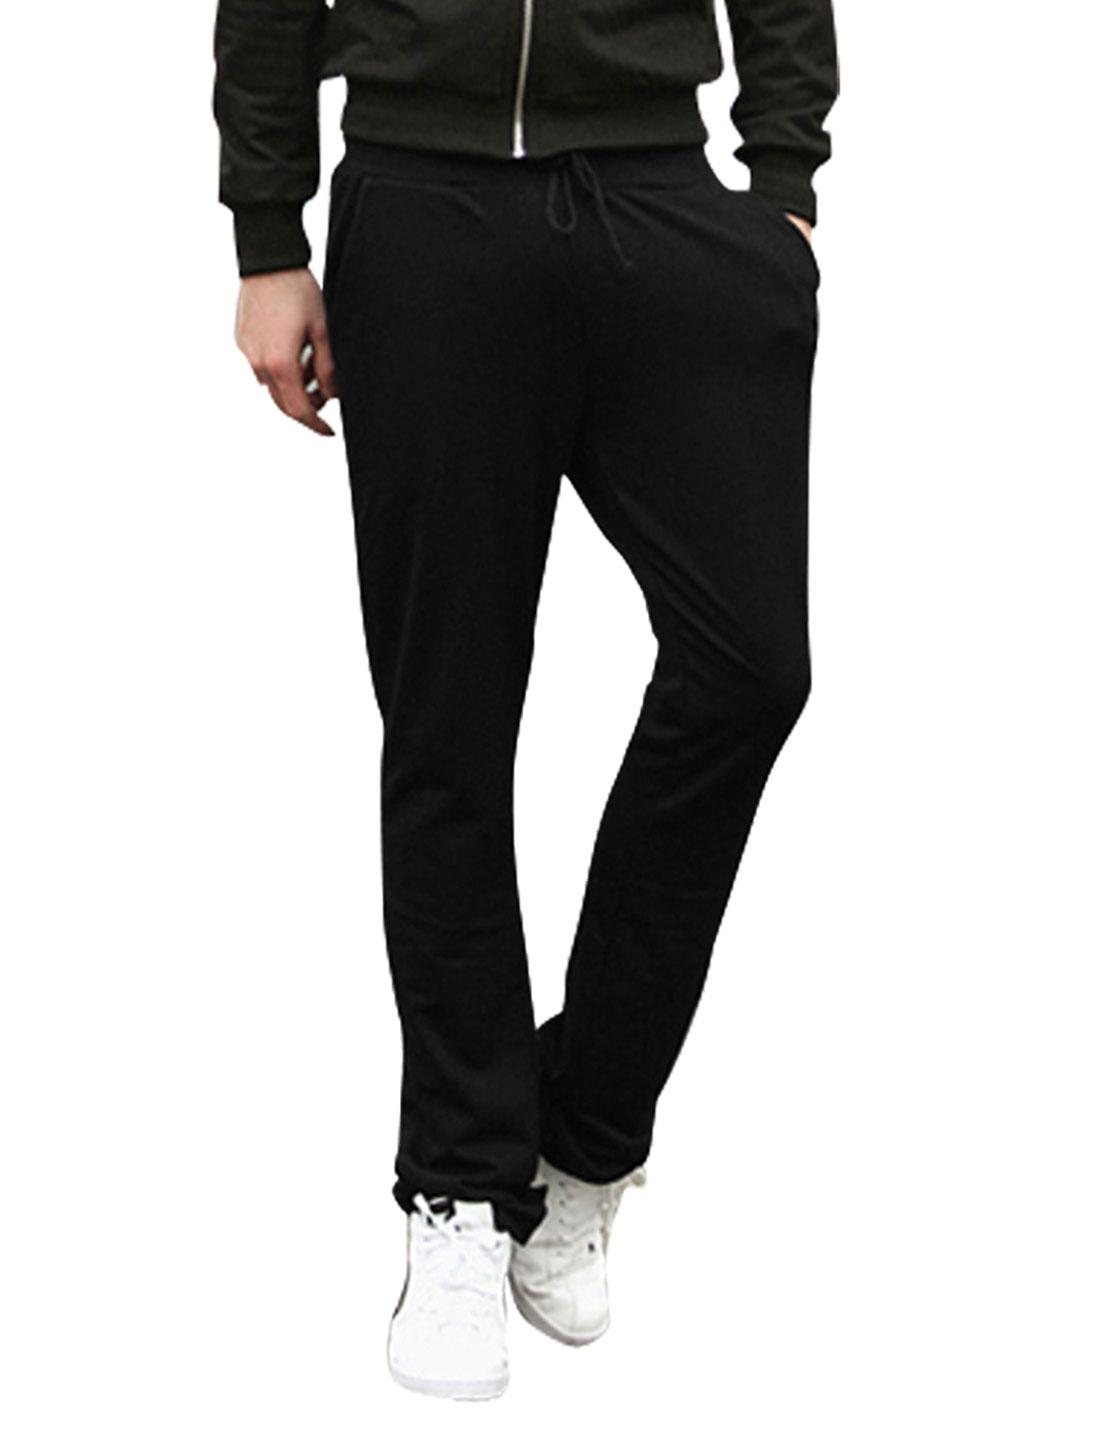 Men Drawstring Waist Slant Pockets Casual Pants Black W30